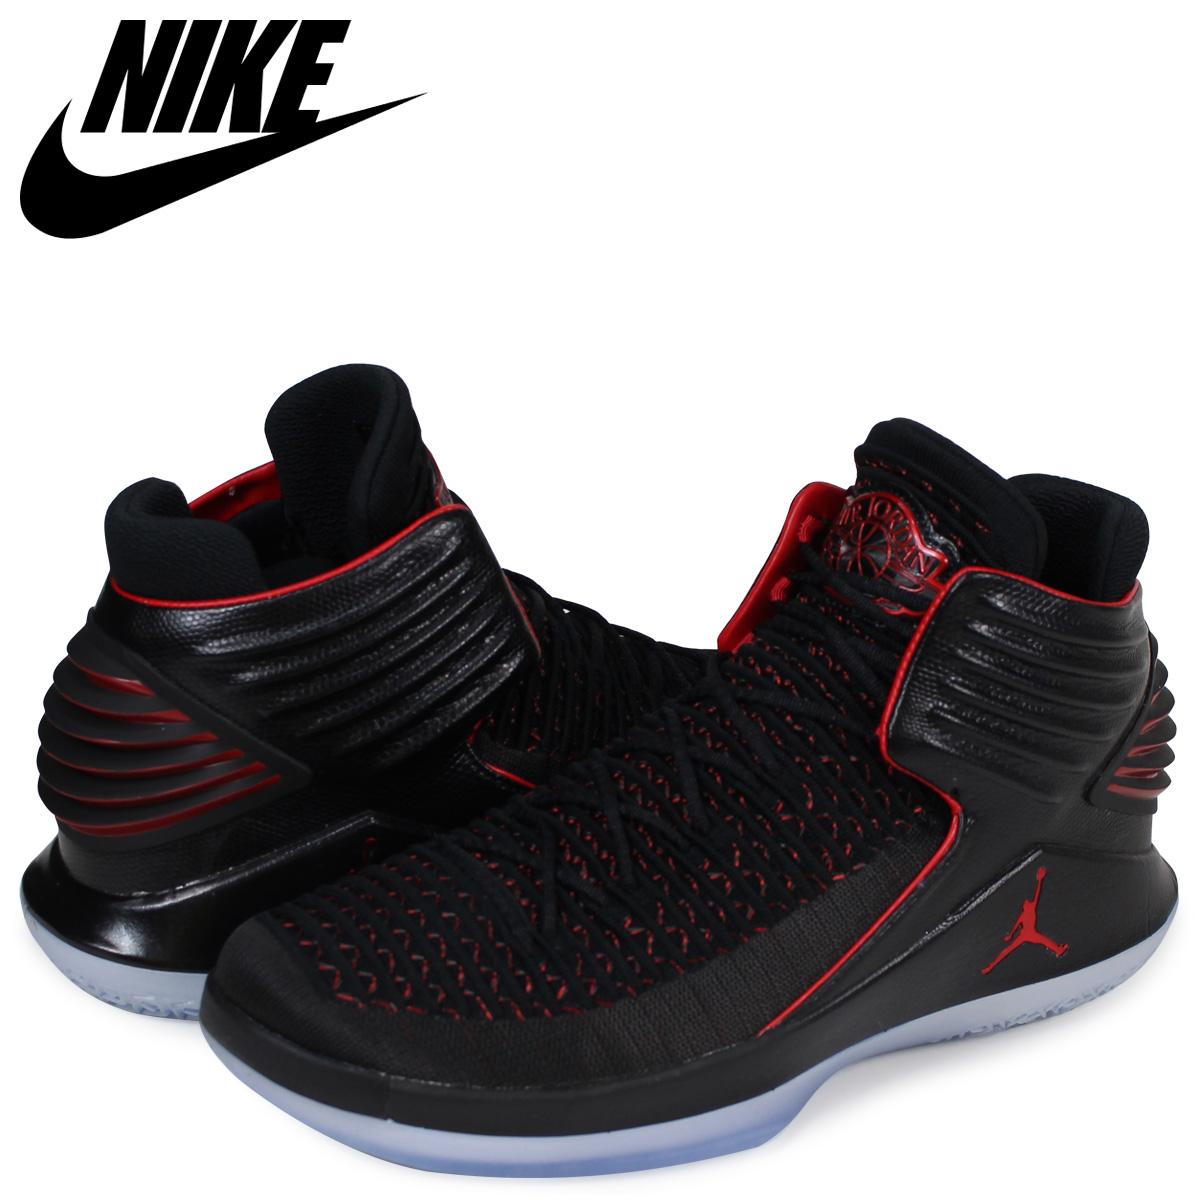 mode designer e81eb f48e3 NIKE AIR JORDAN XXII PF Nike Air Jordan 32 sneakers AH3348-001 men black